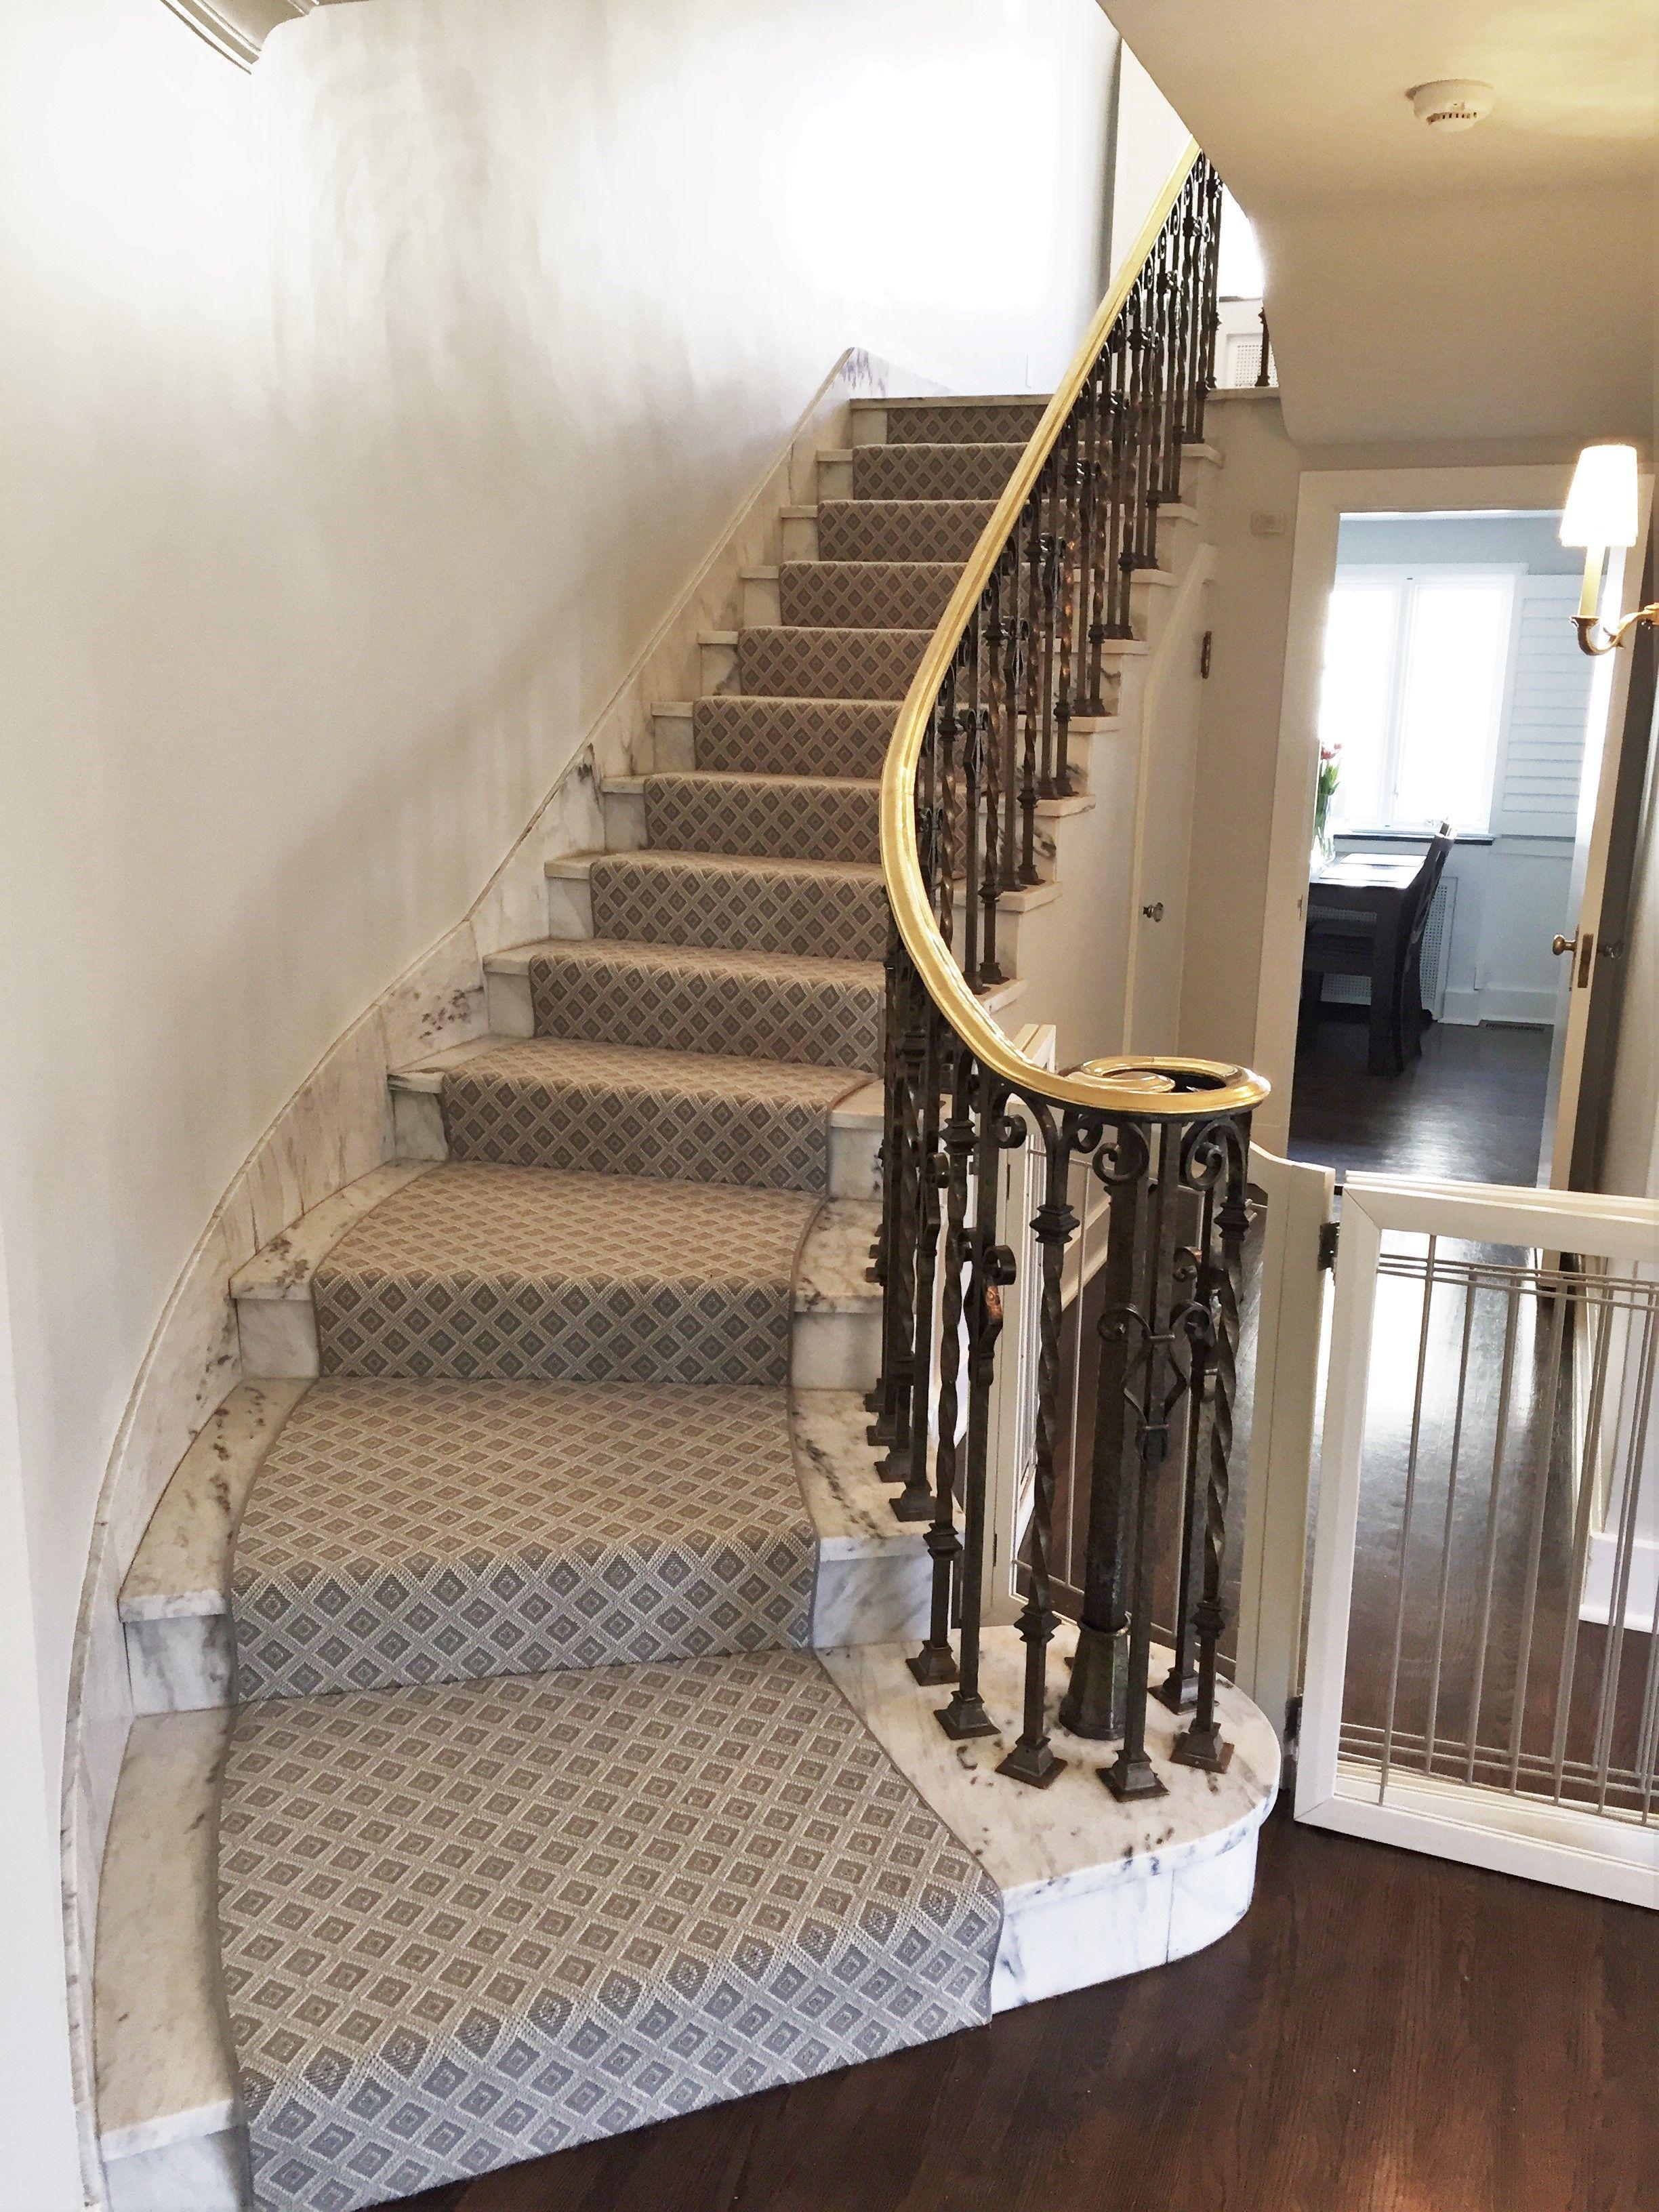 Superior Custom Stark Carpet Stair Runner In Adalie, Shadow. Shadyside, PA. 2016